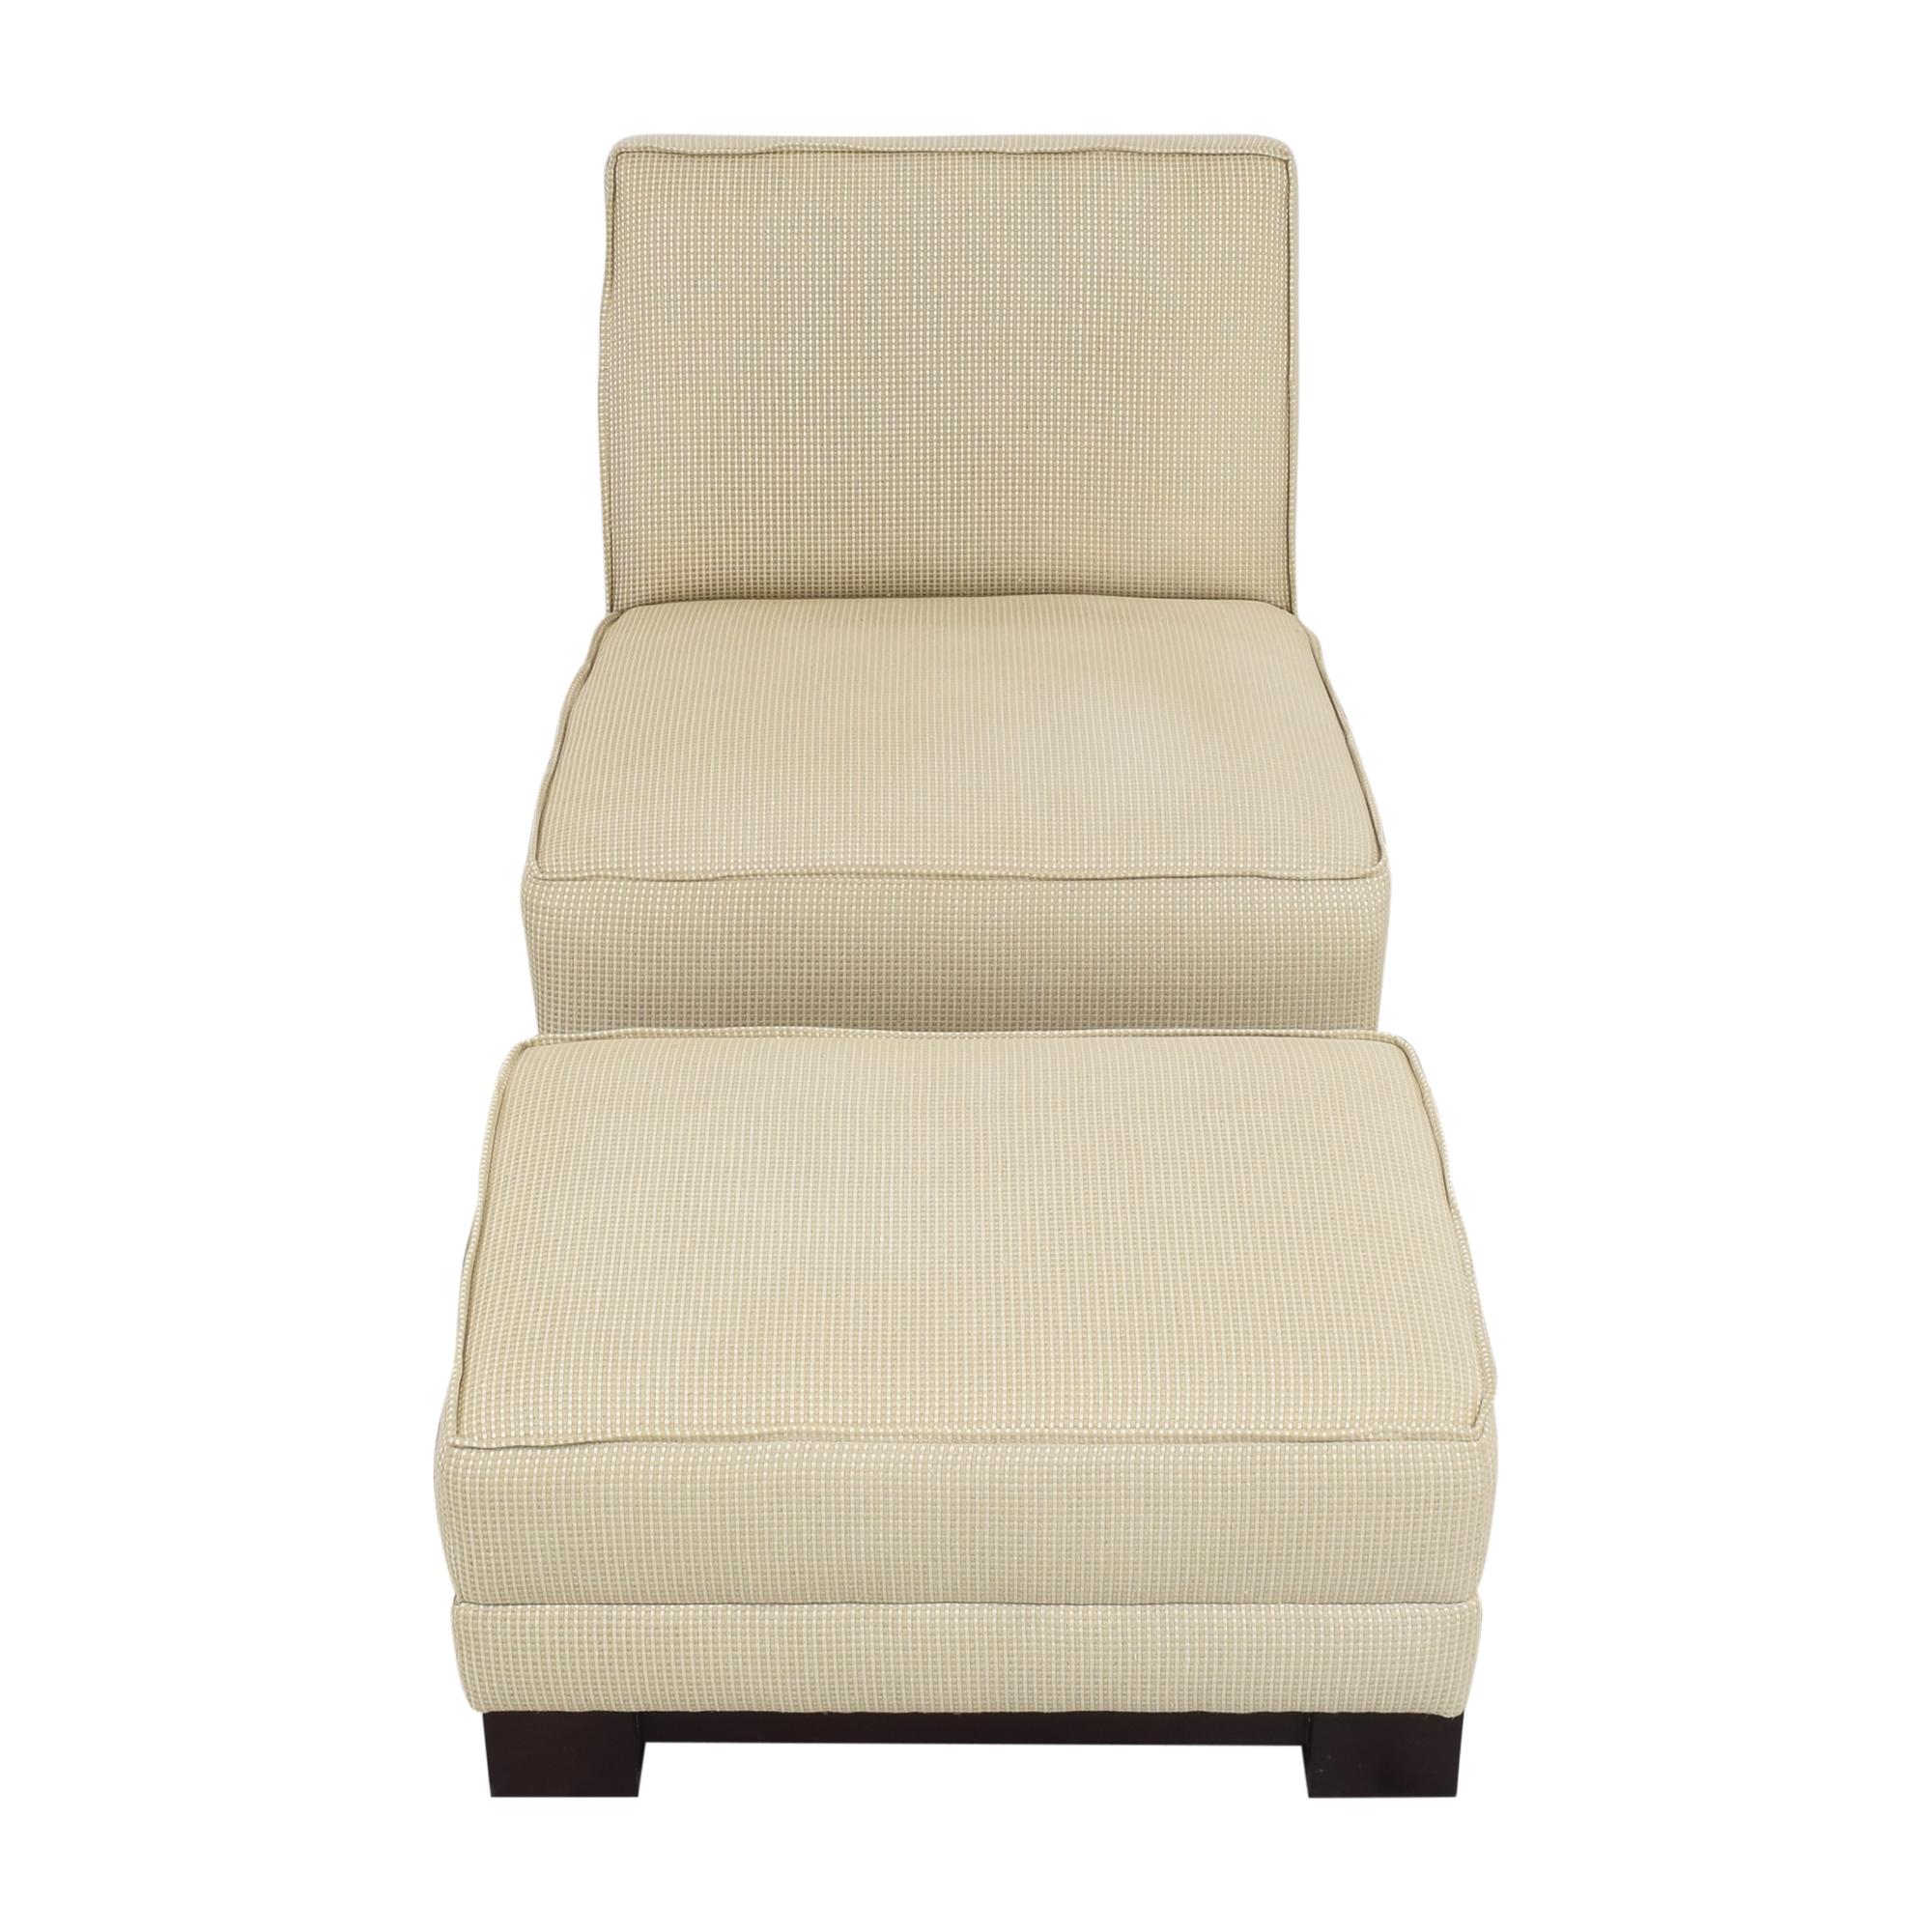 Ralph Lauren Home Ralph Lauren Home Hasley Slipper Chair with Ottoman price